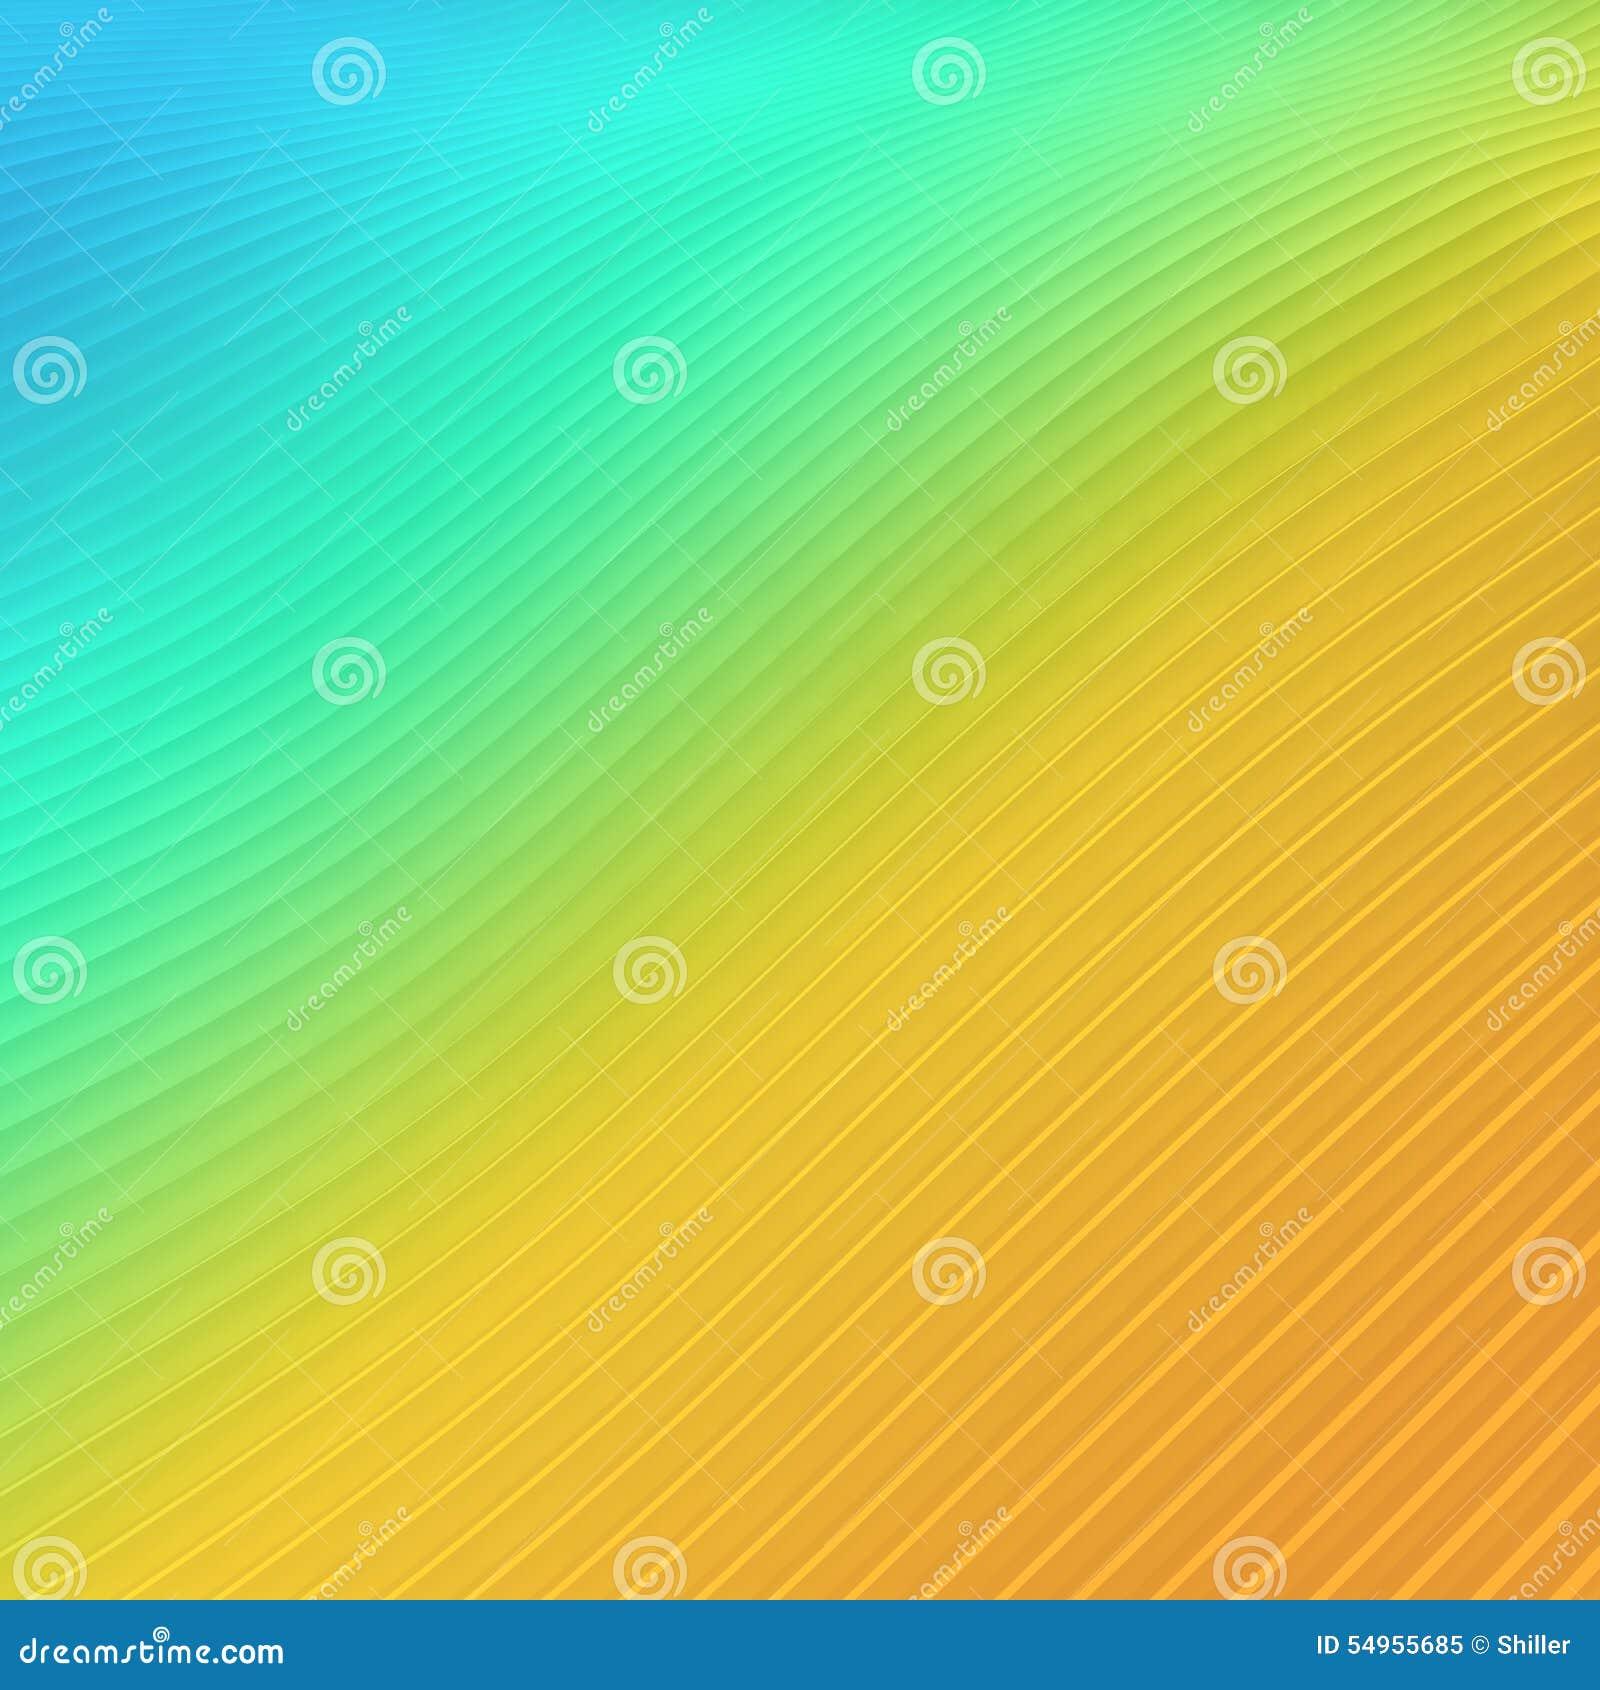 Can Shiller Graphics Design